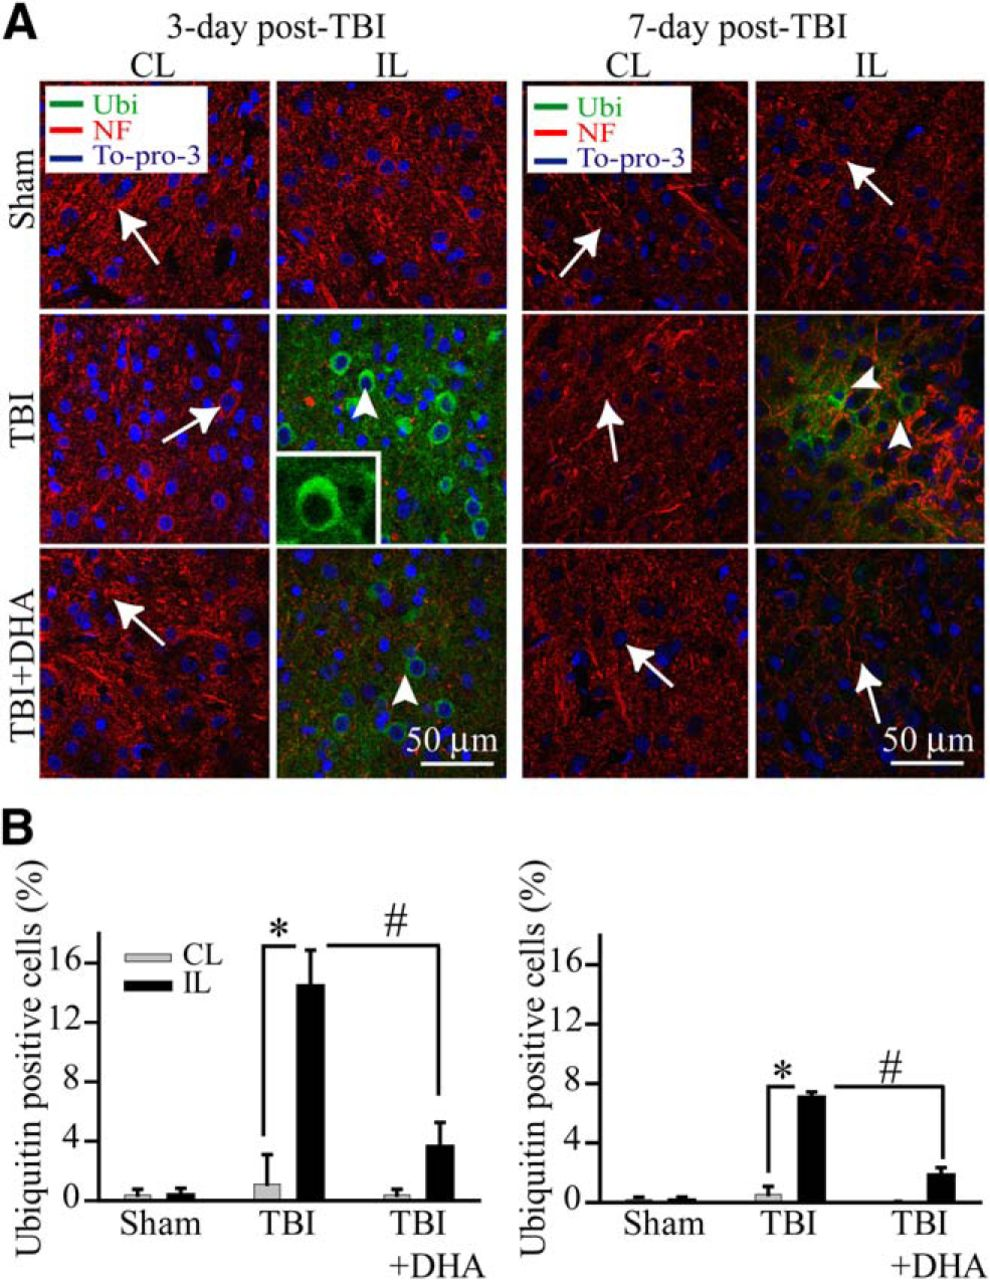 Docosahexaenoic Acid Reduces ER Stress and Abnormal Protein